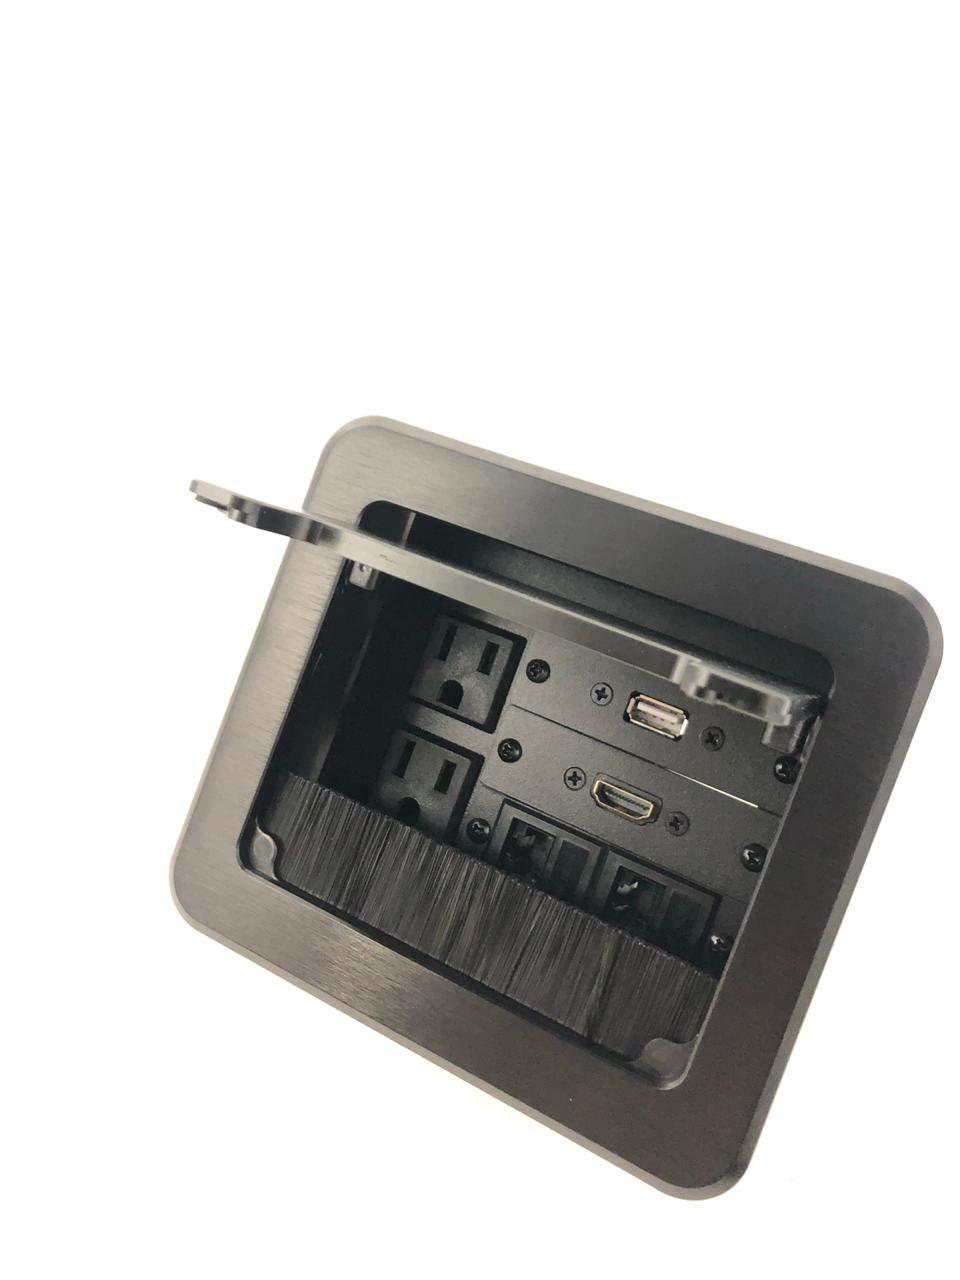 Yolkvisual Conference Table Connectivity AV Box 2 AC + 1 HDMI + 1 USB + 2 RJ45 Black by YolkVisual (Image #1)